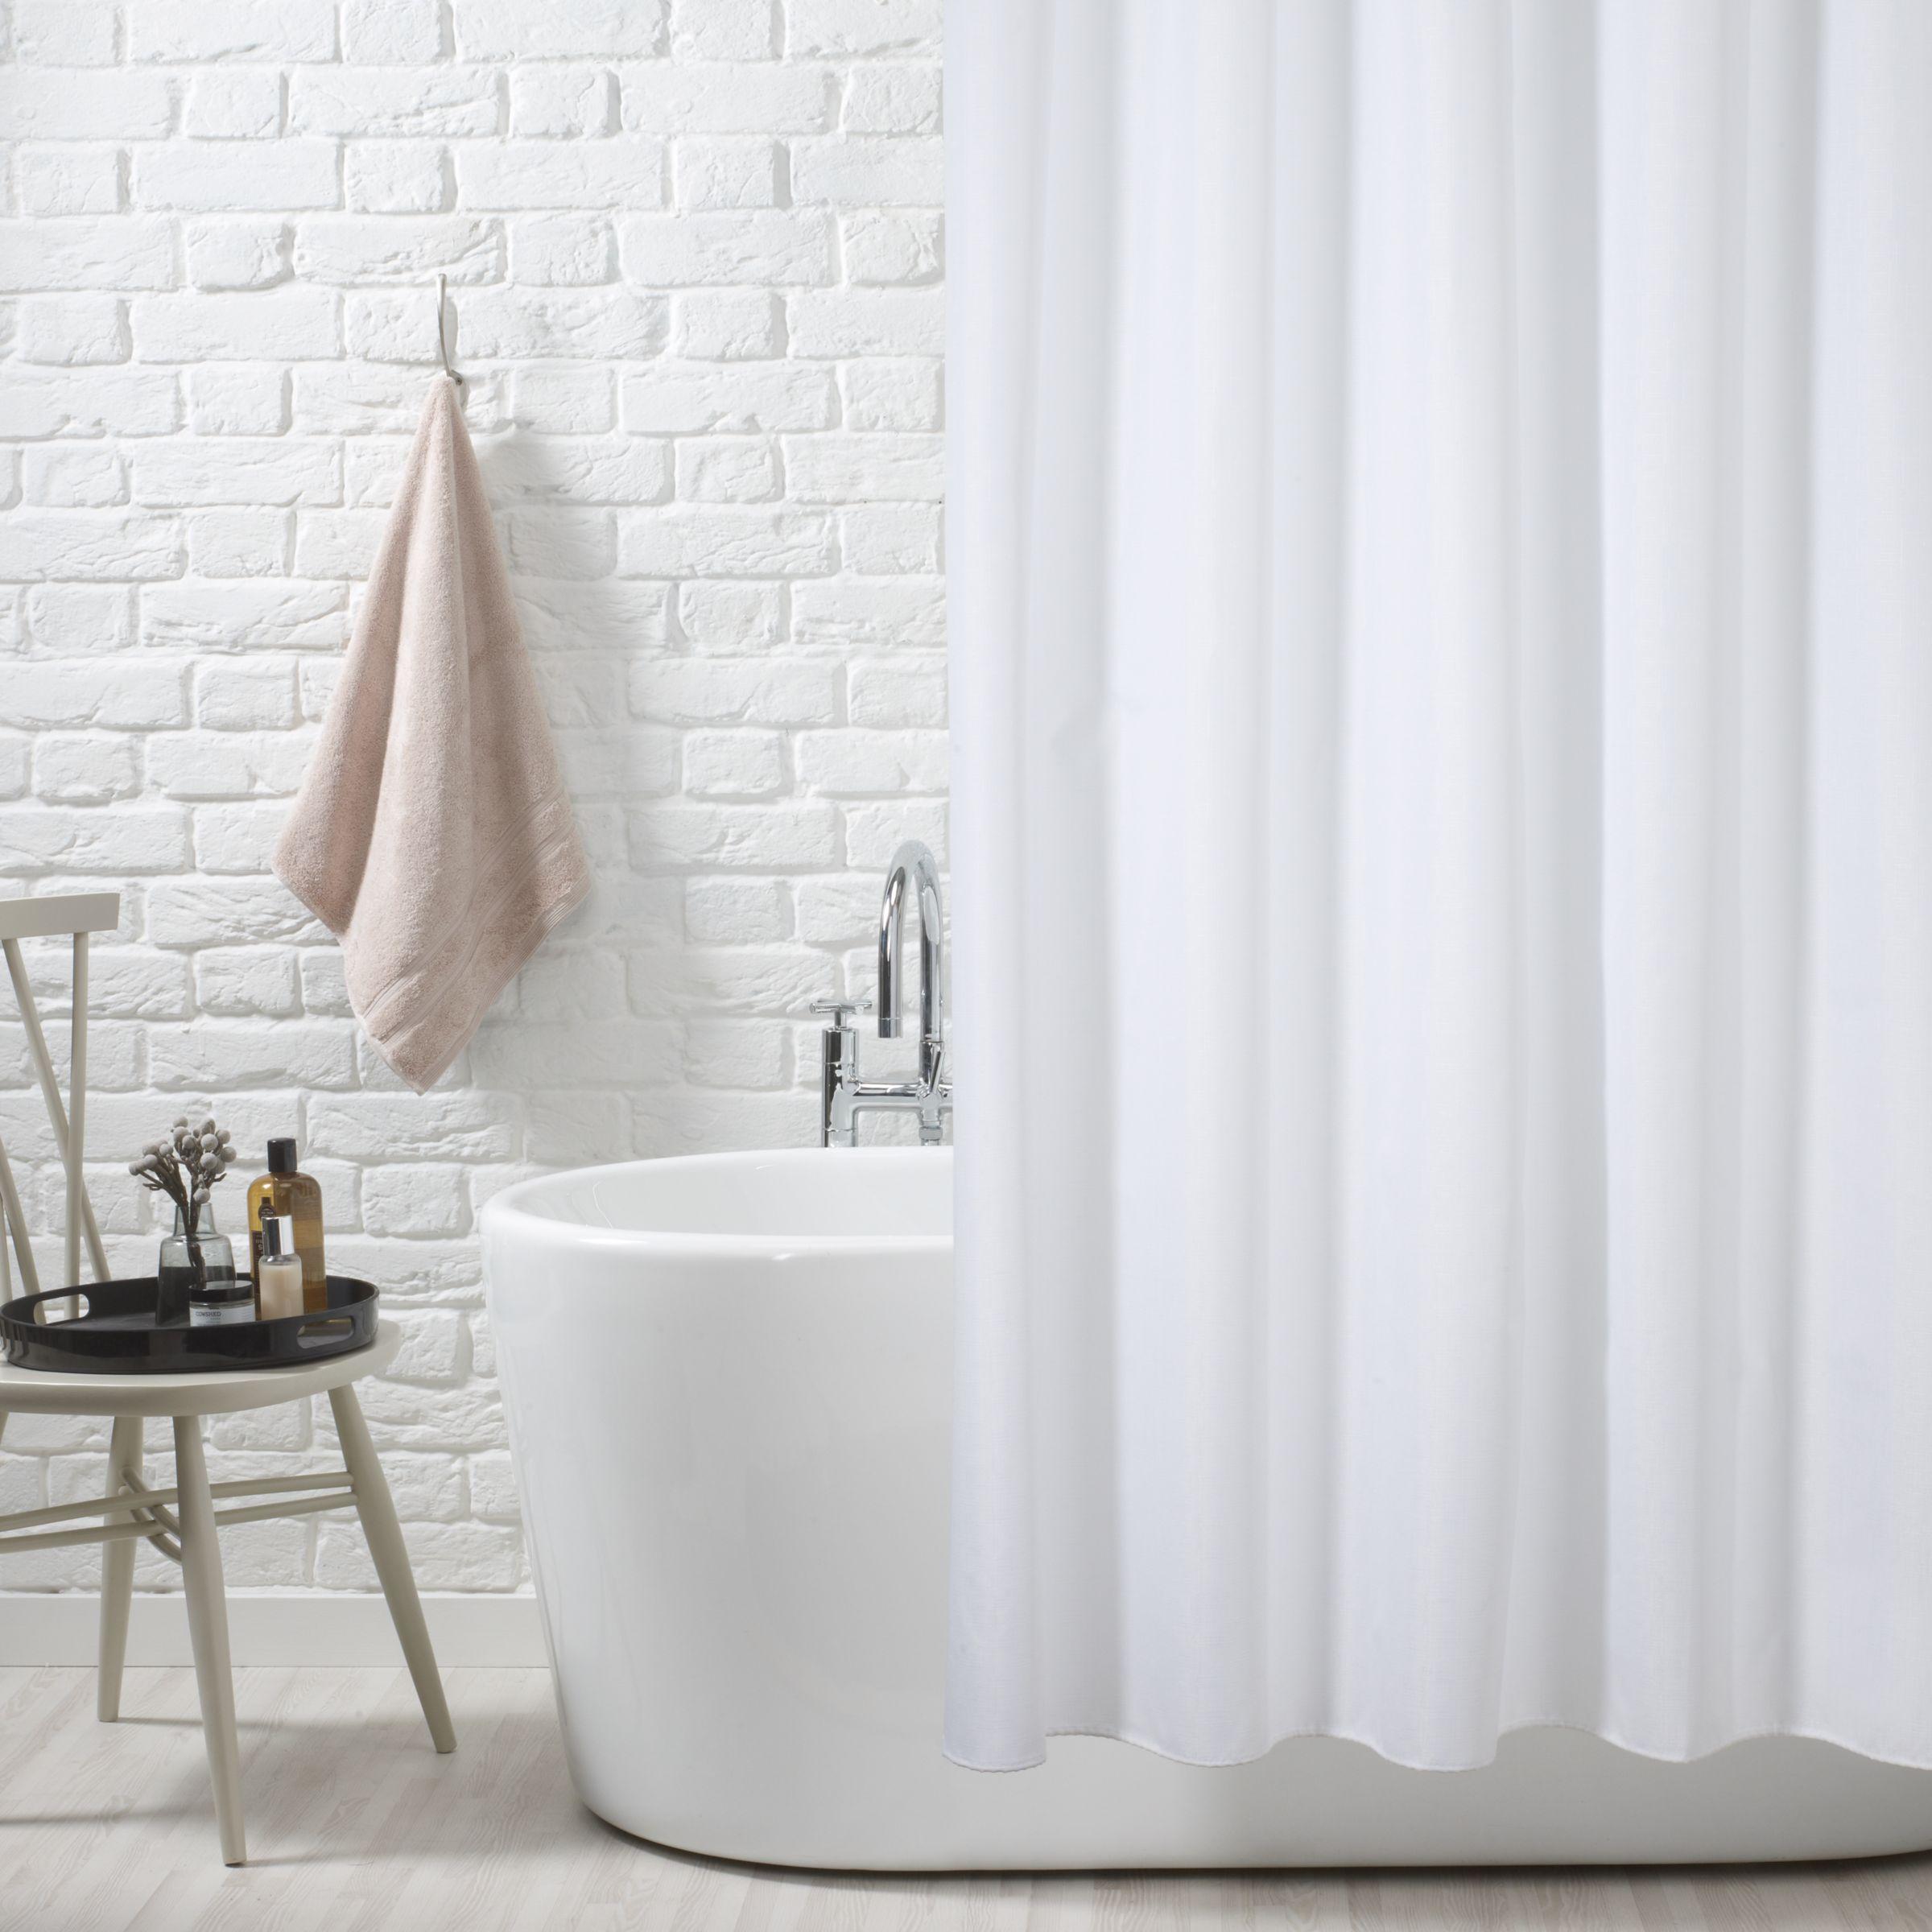 Shower Curtain Rings John Lewis